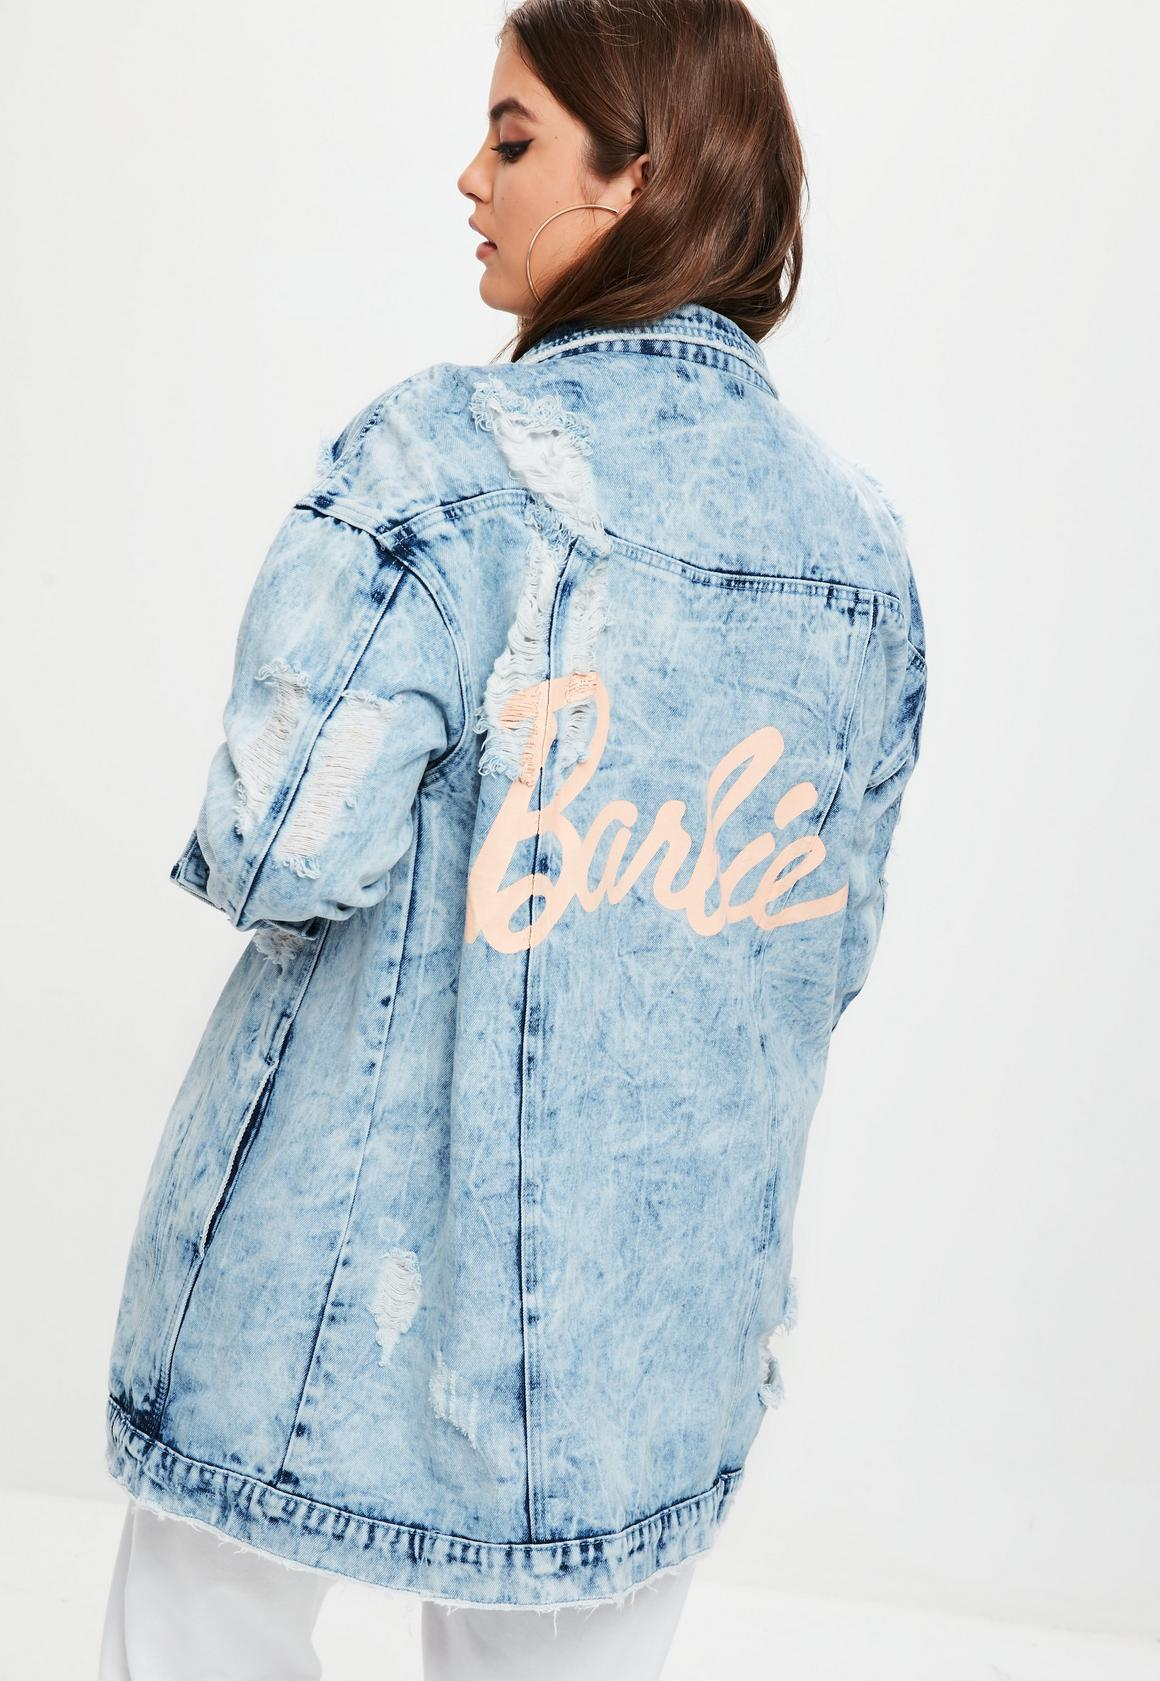 Plus Size Barbie x Missguided Blue Barbie Denim Jacket | Missguided